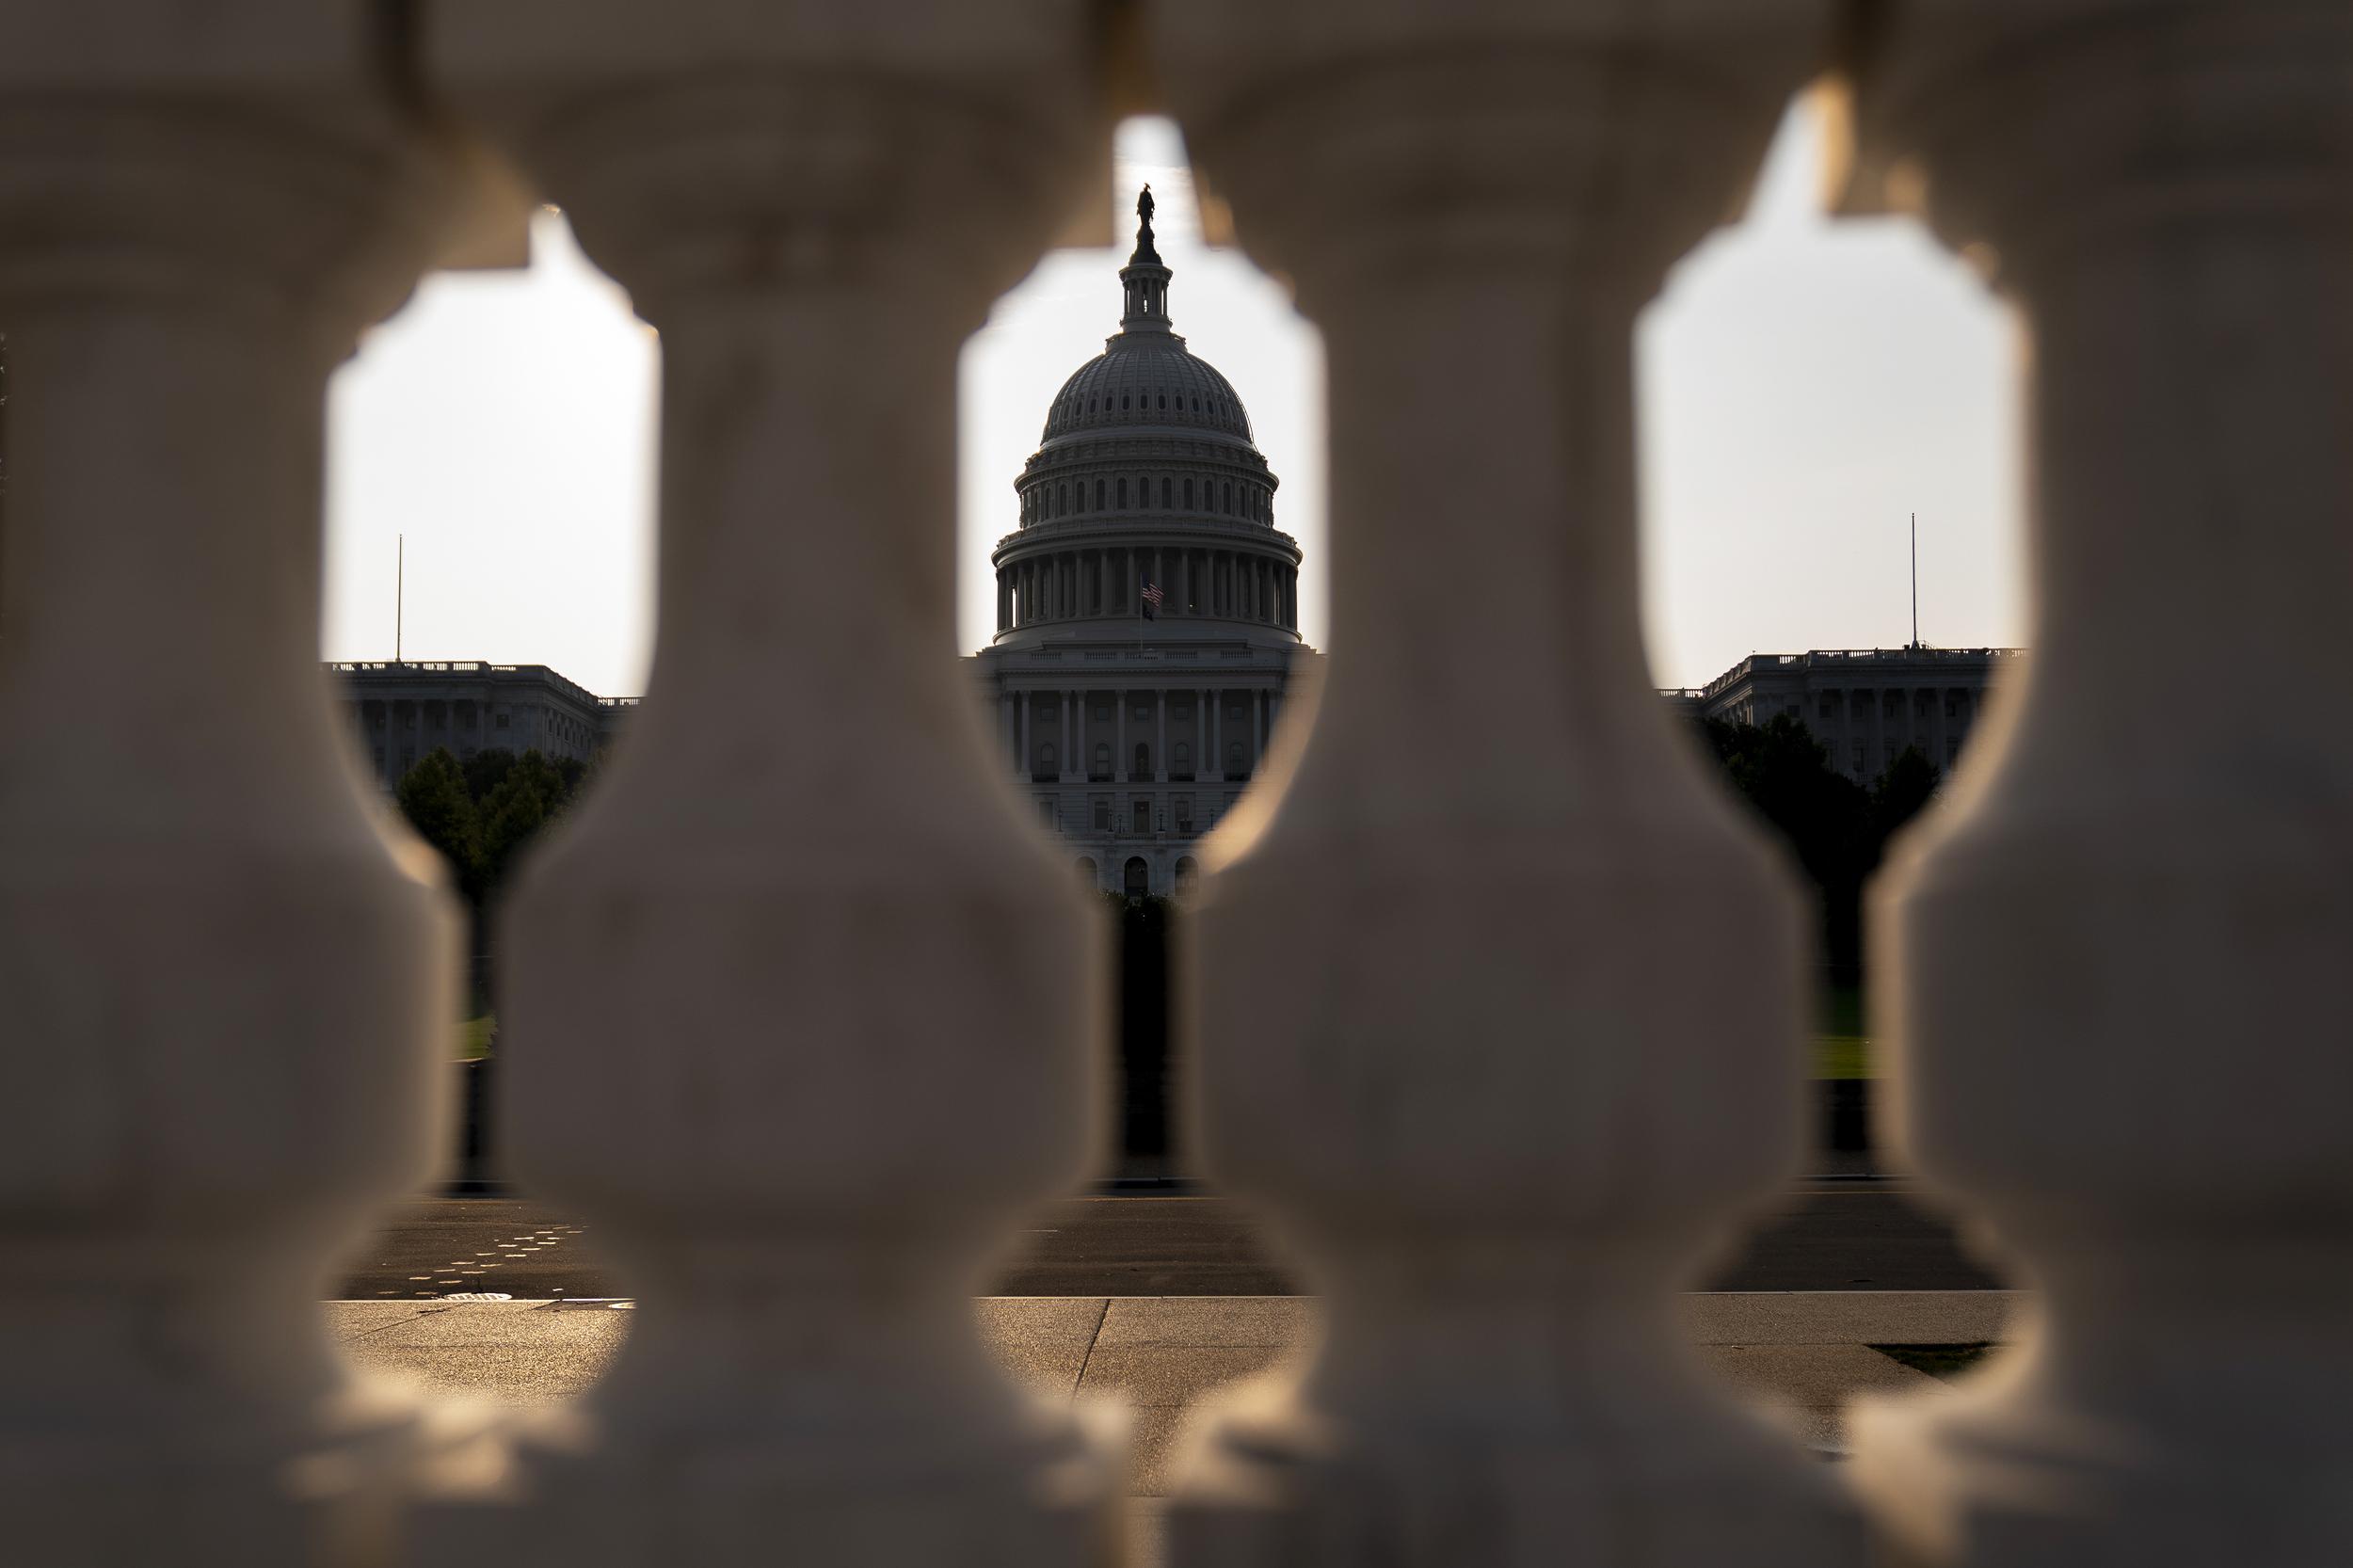 Senate unveils text of $555 billion bipartisan infrastructure package